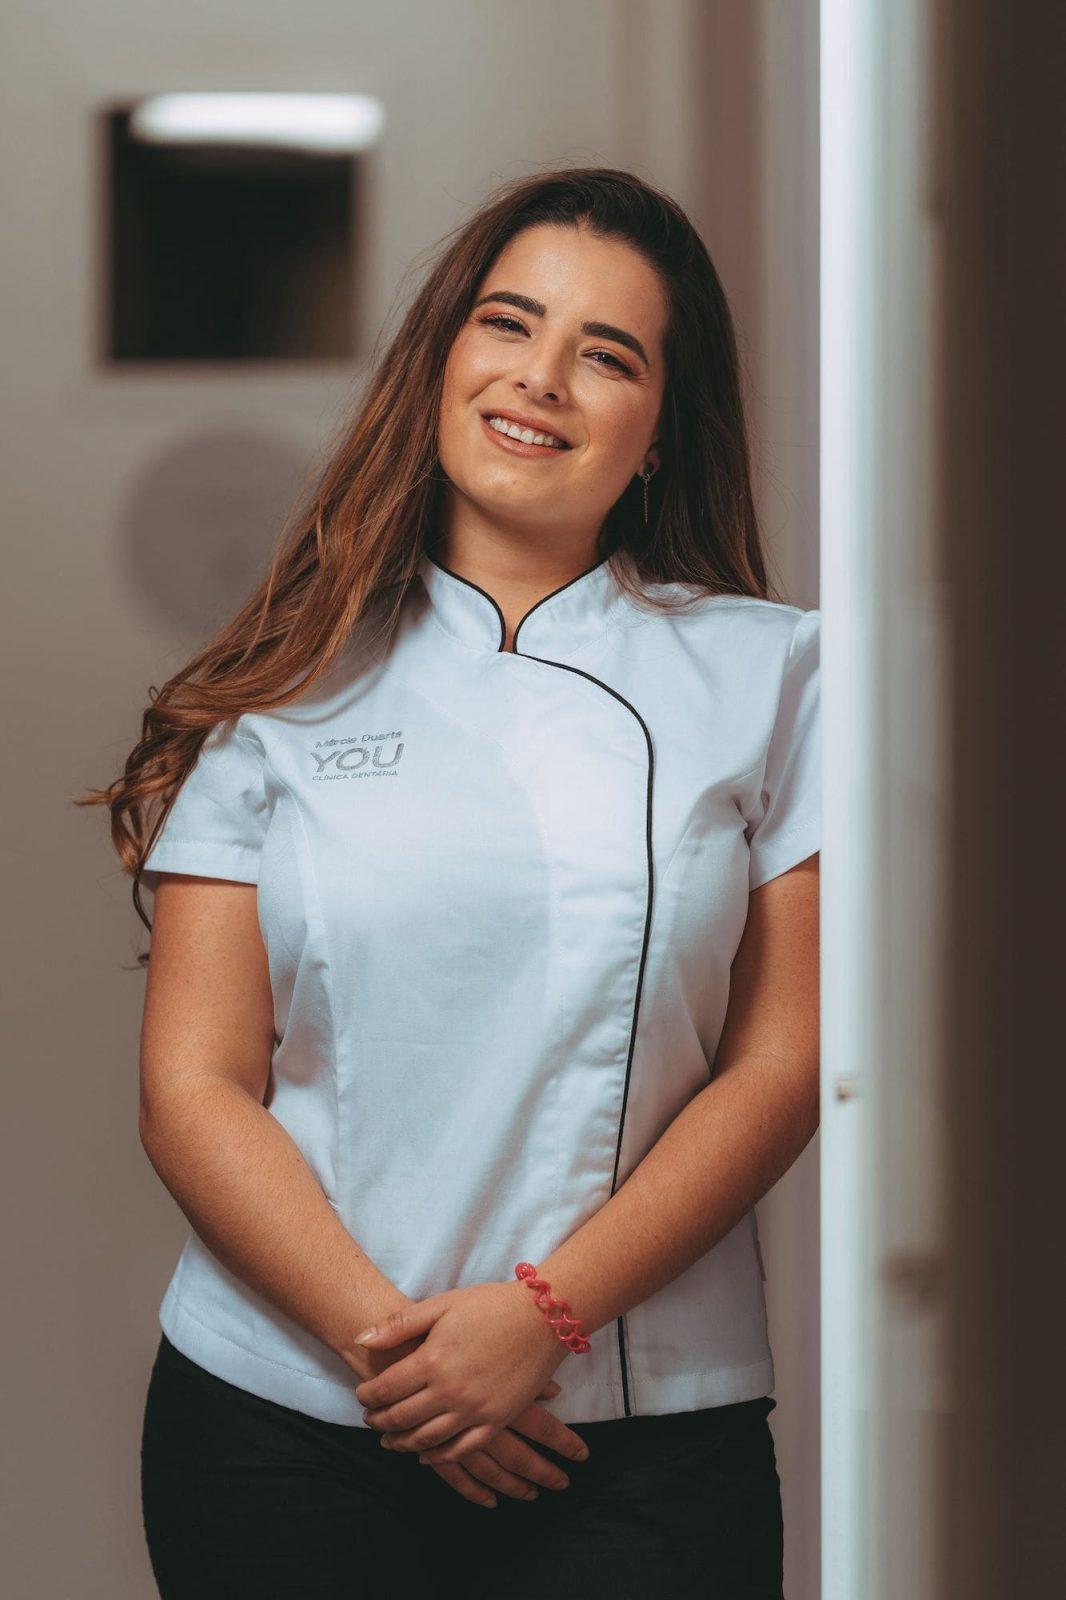 Marcia Duarte